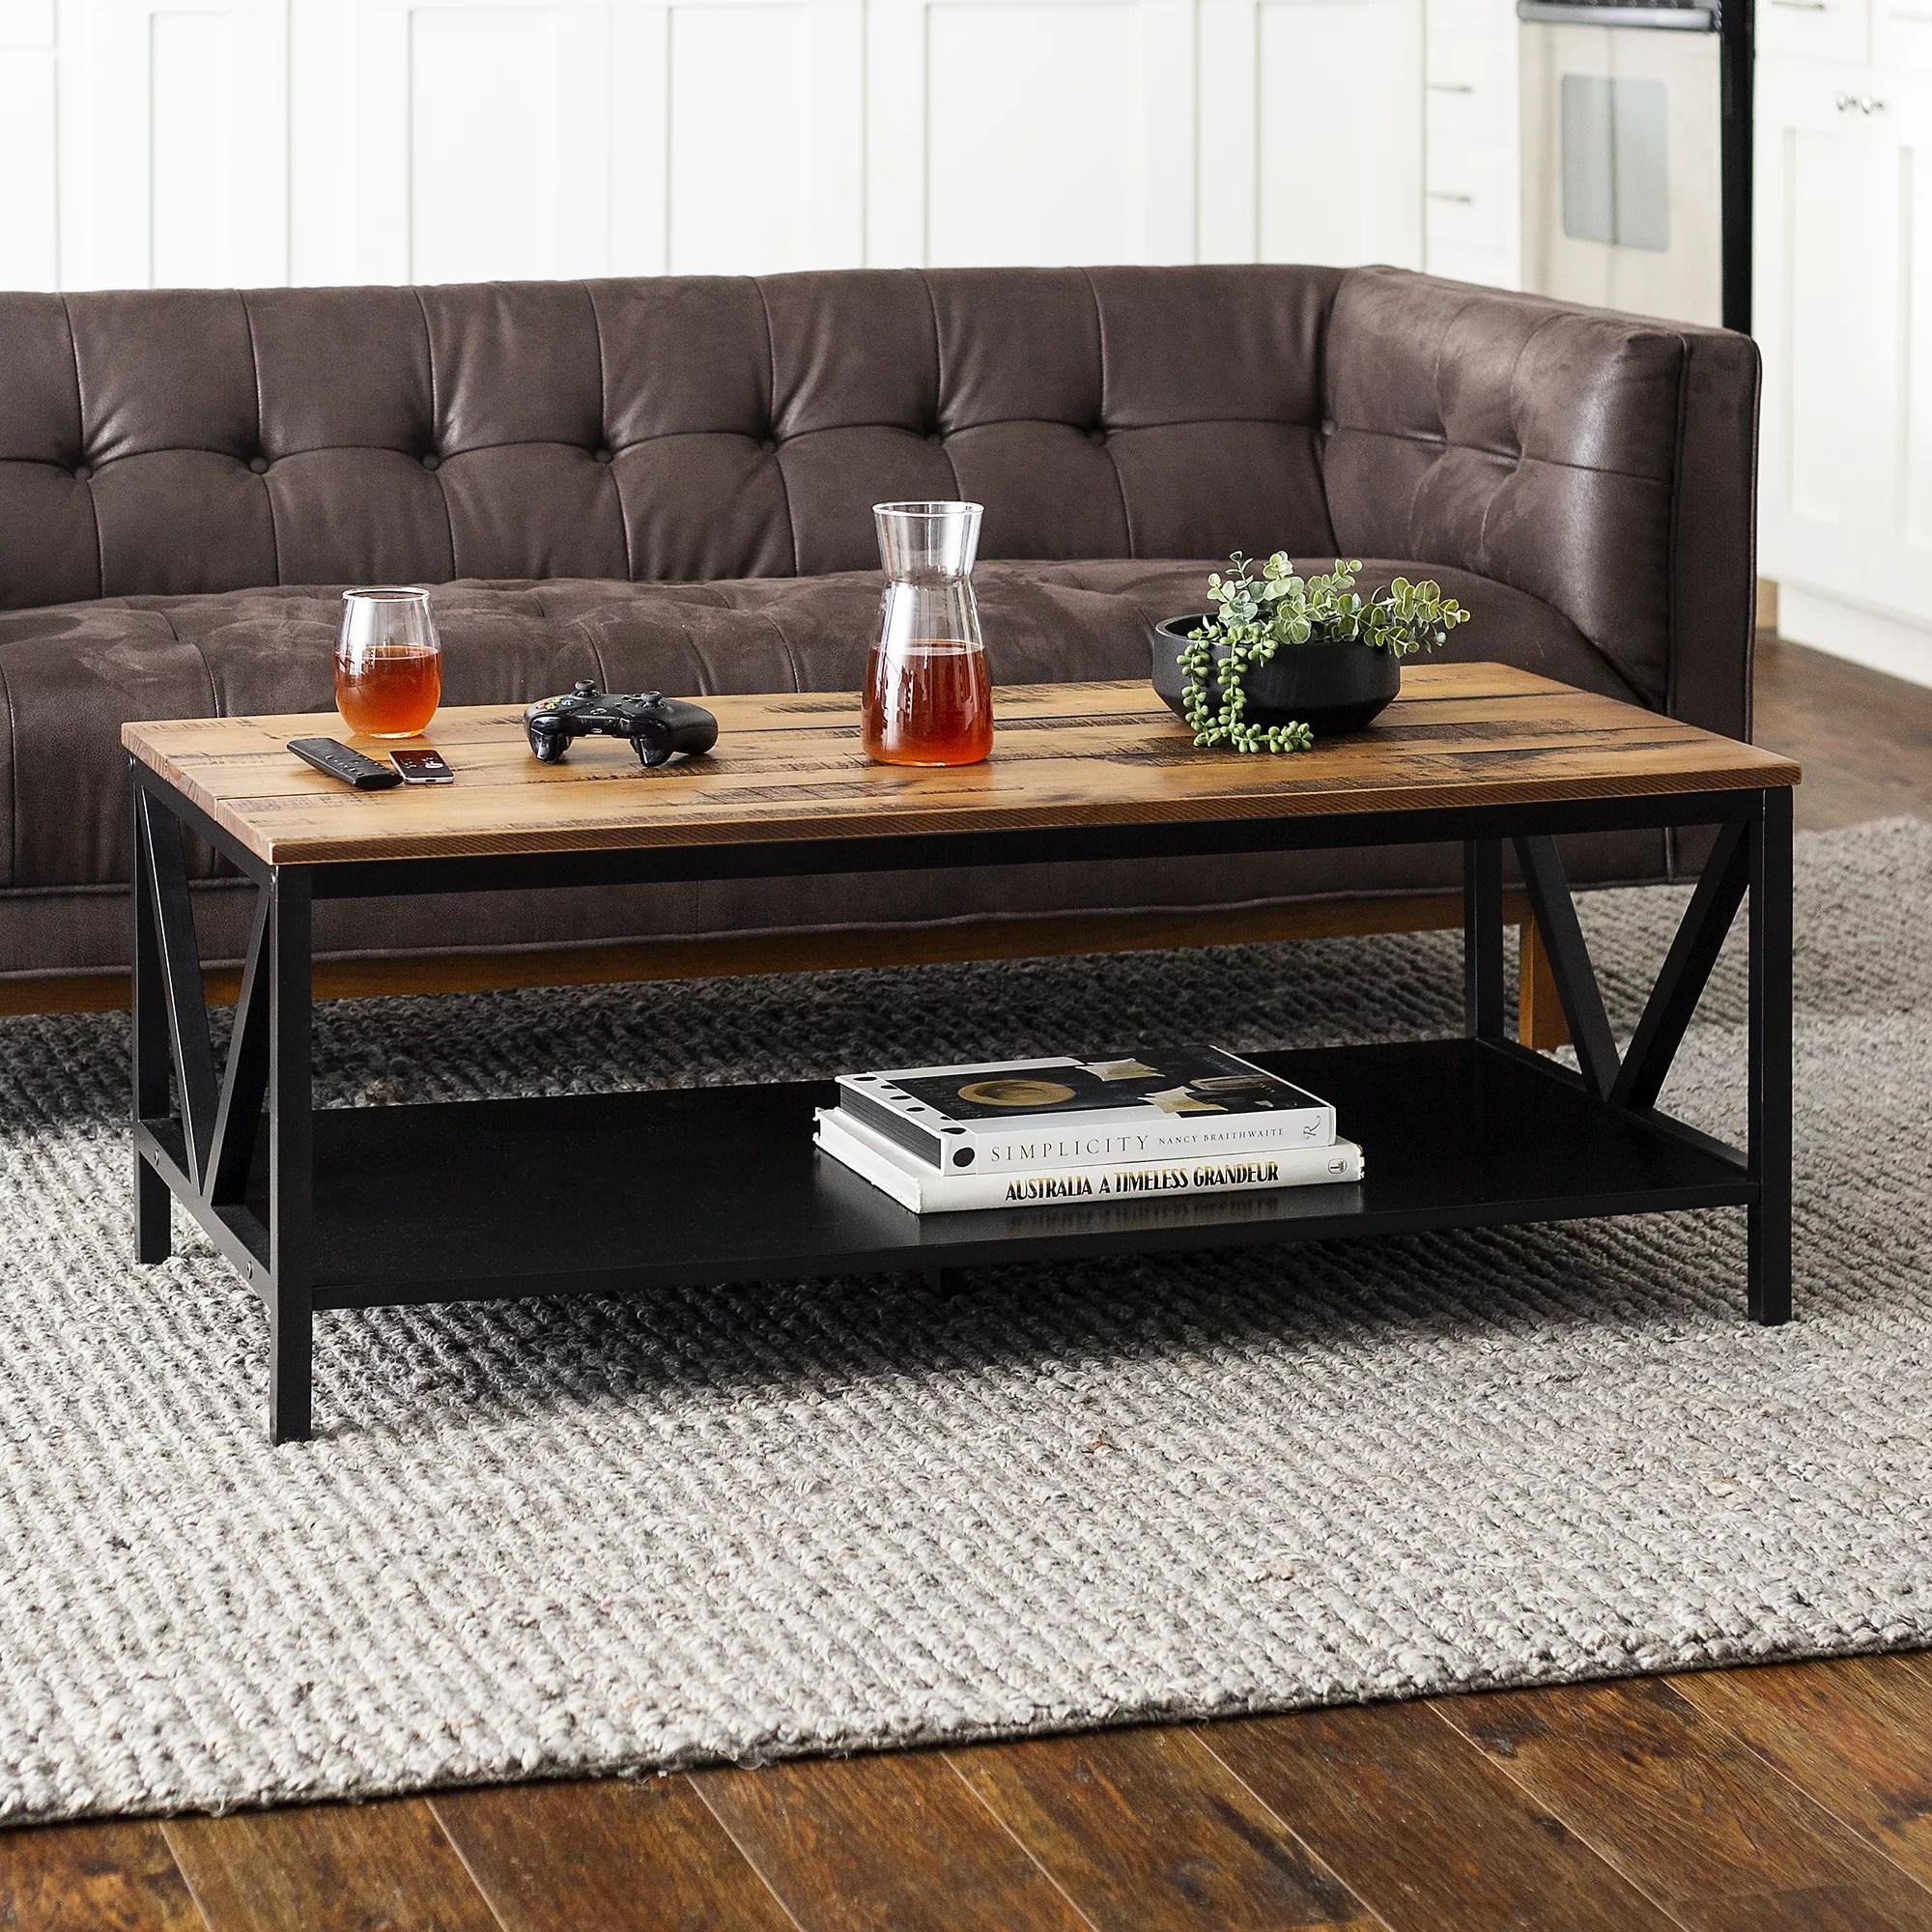 Distressed Farmhouse Solid Wood Coffee Table 48 Bjs Wholesale Club